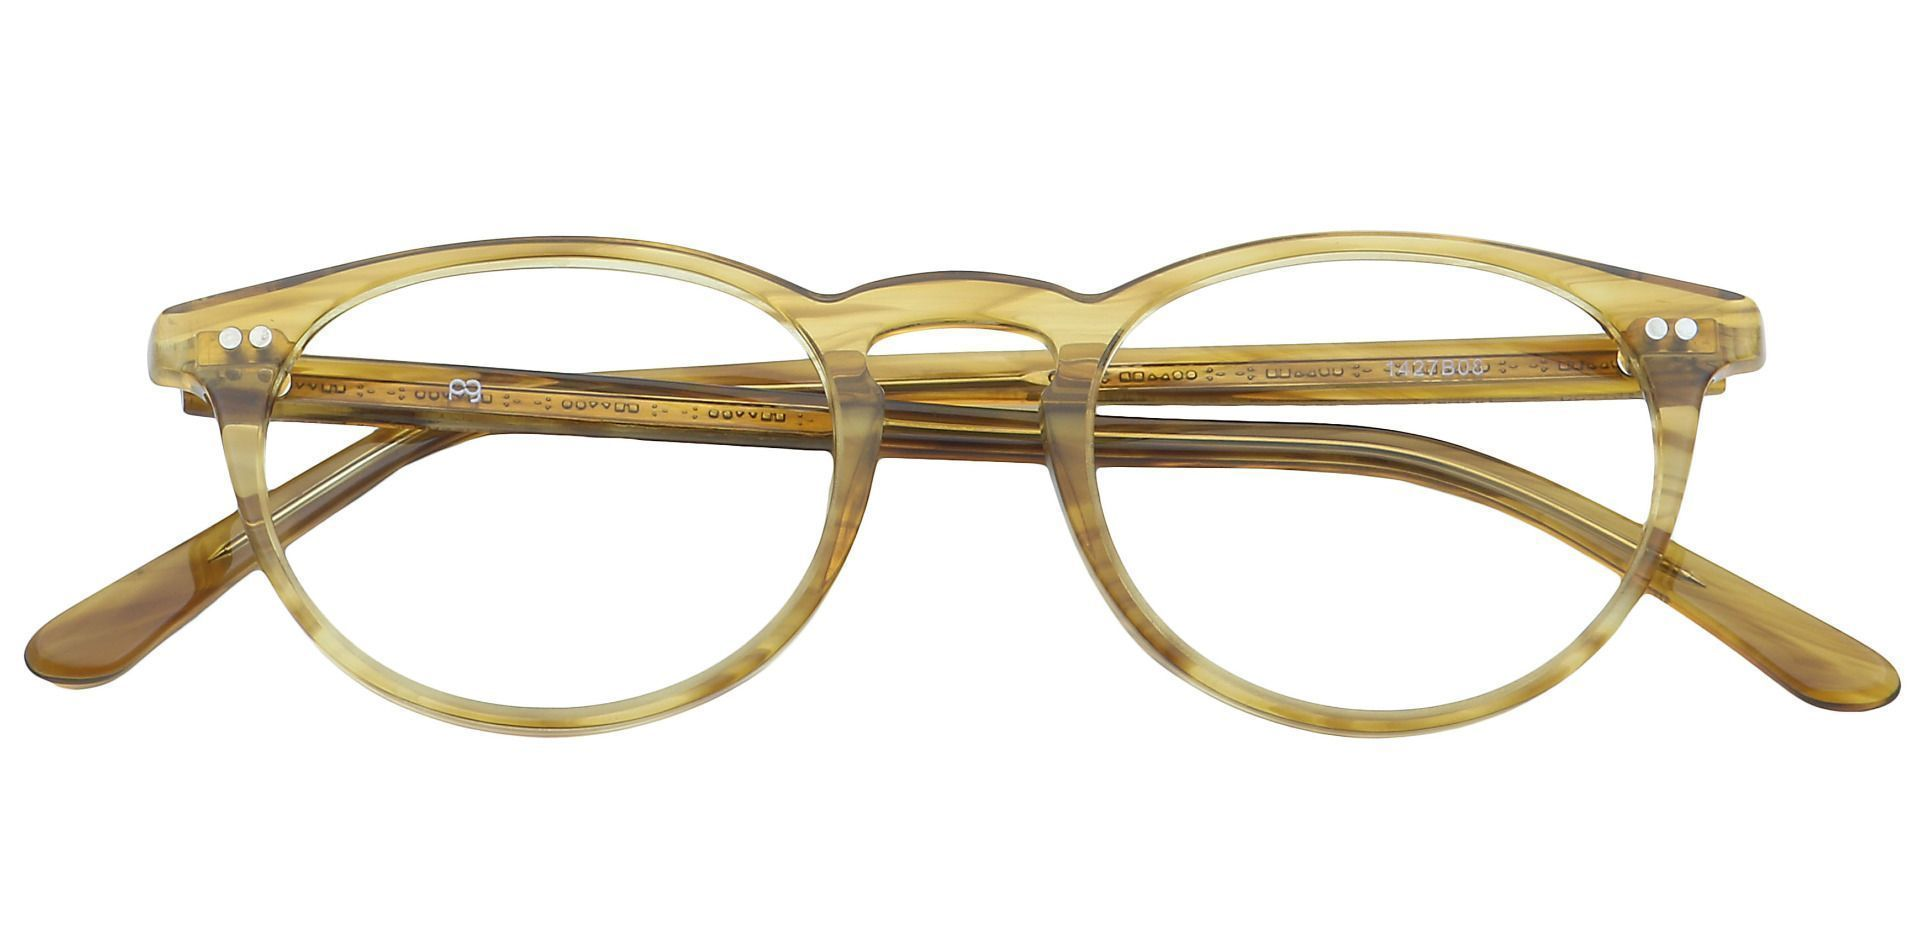 Marley Oval Prescription Glasses - Brown